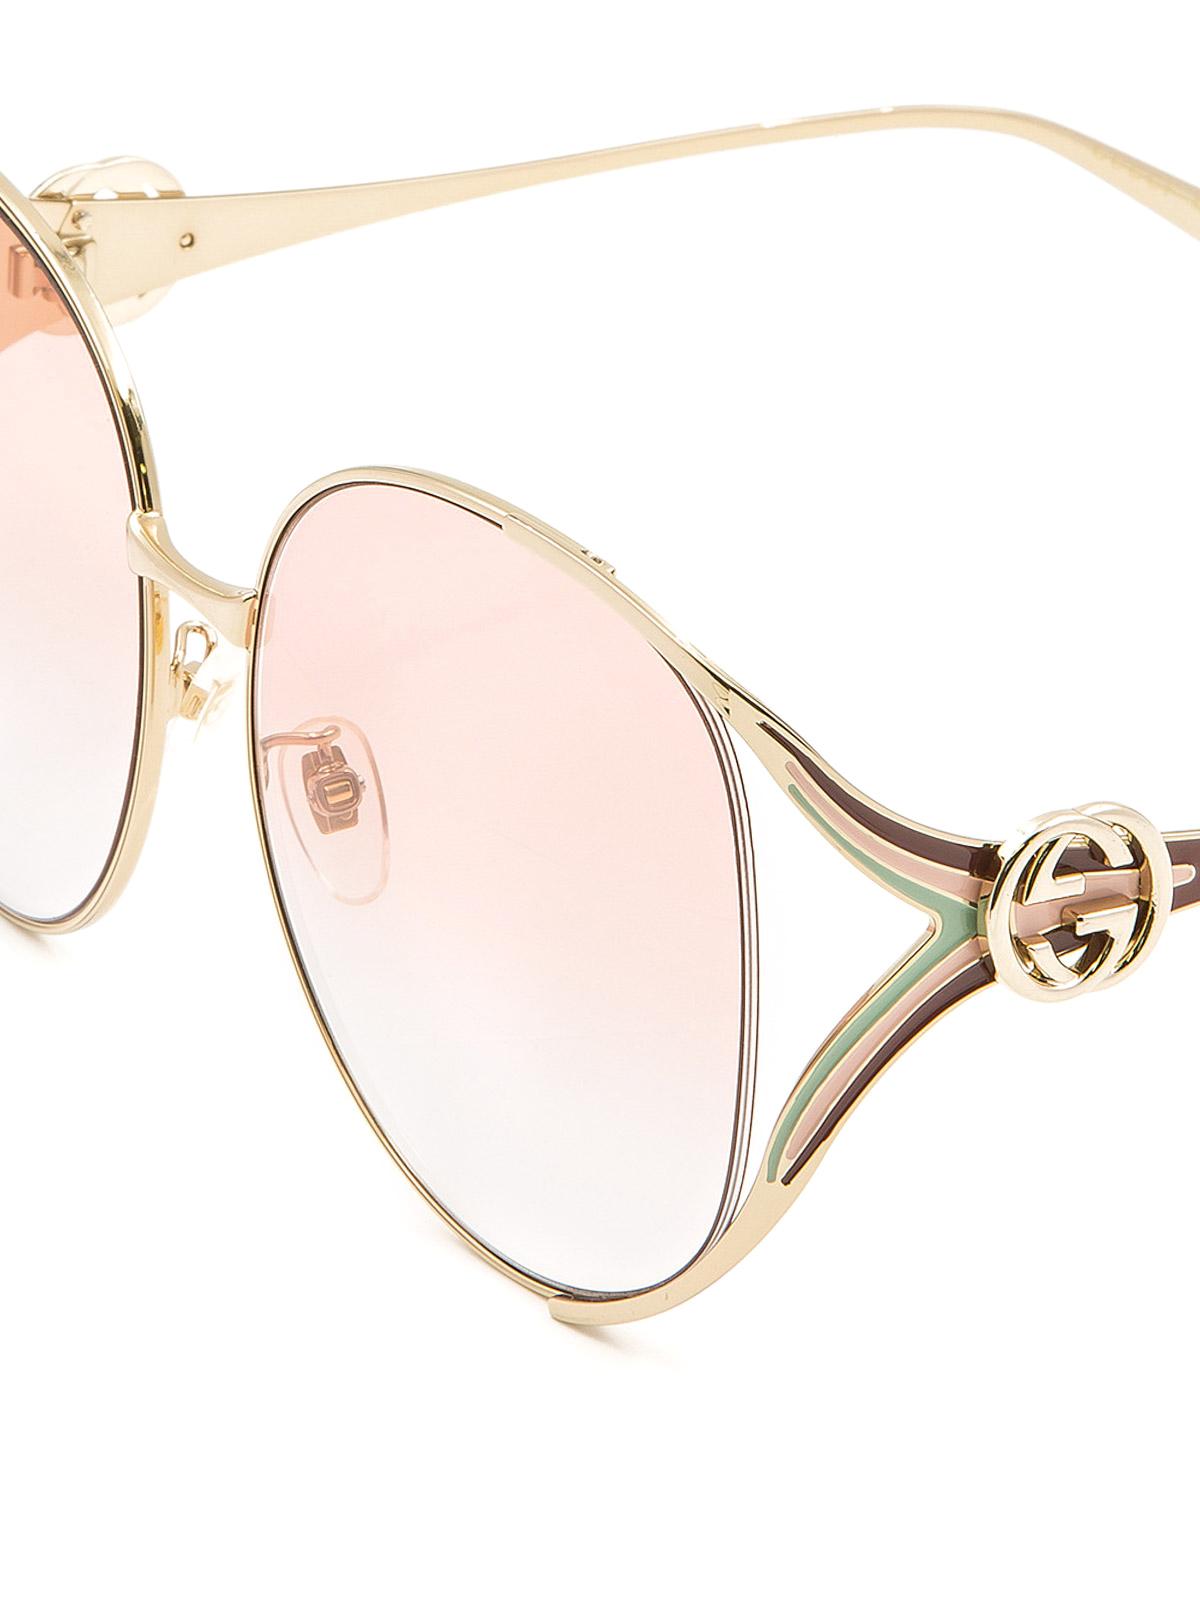 Gucci - Round slim metal frame sunglasses - sunglasses - GG0225S5